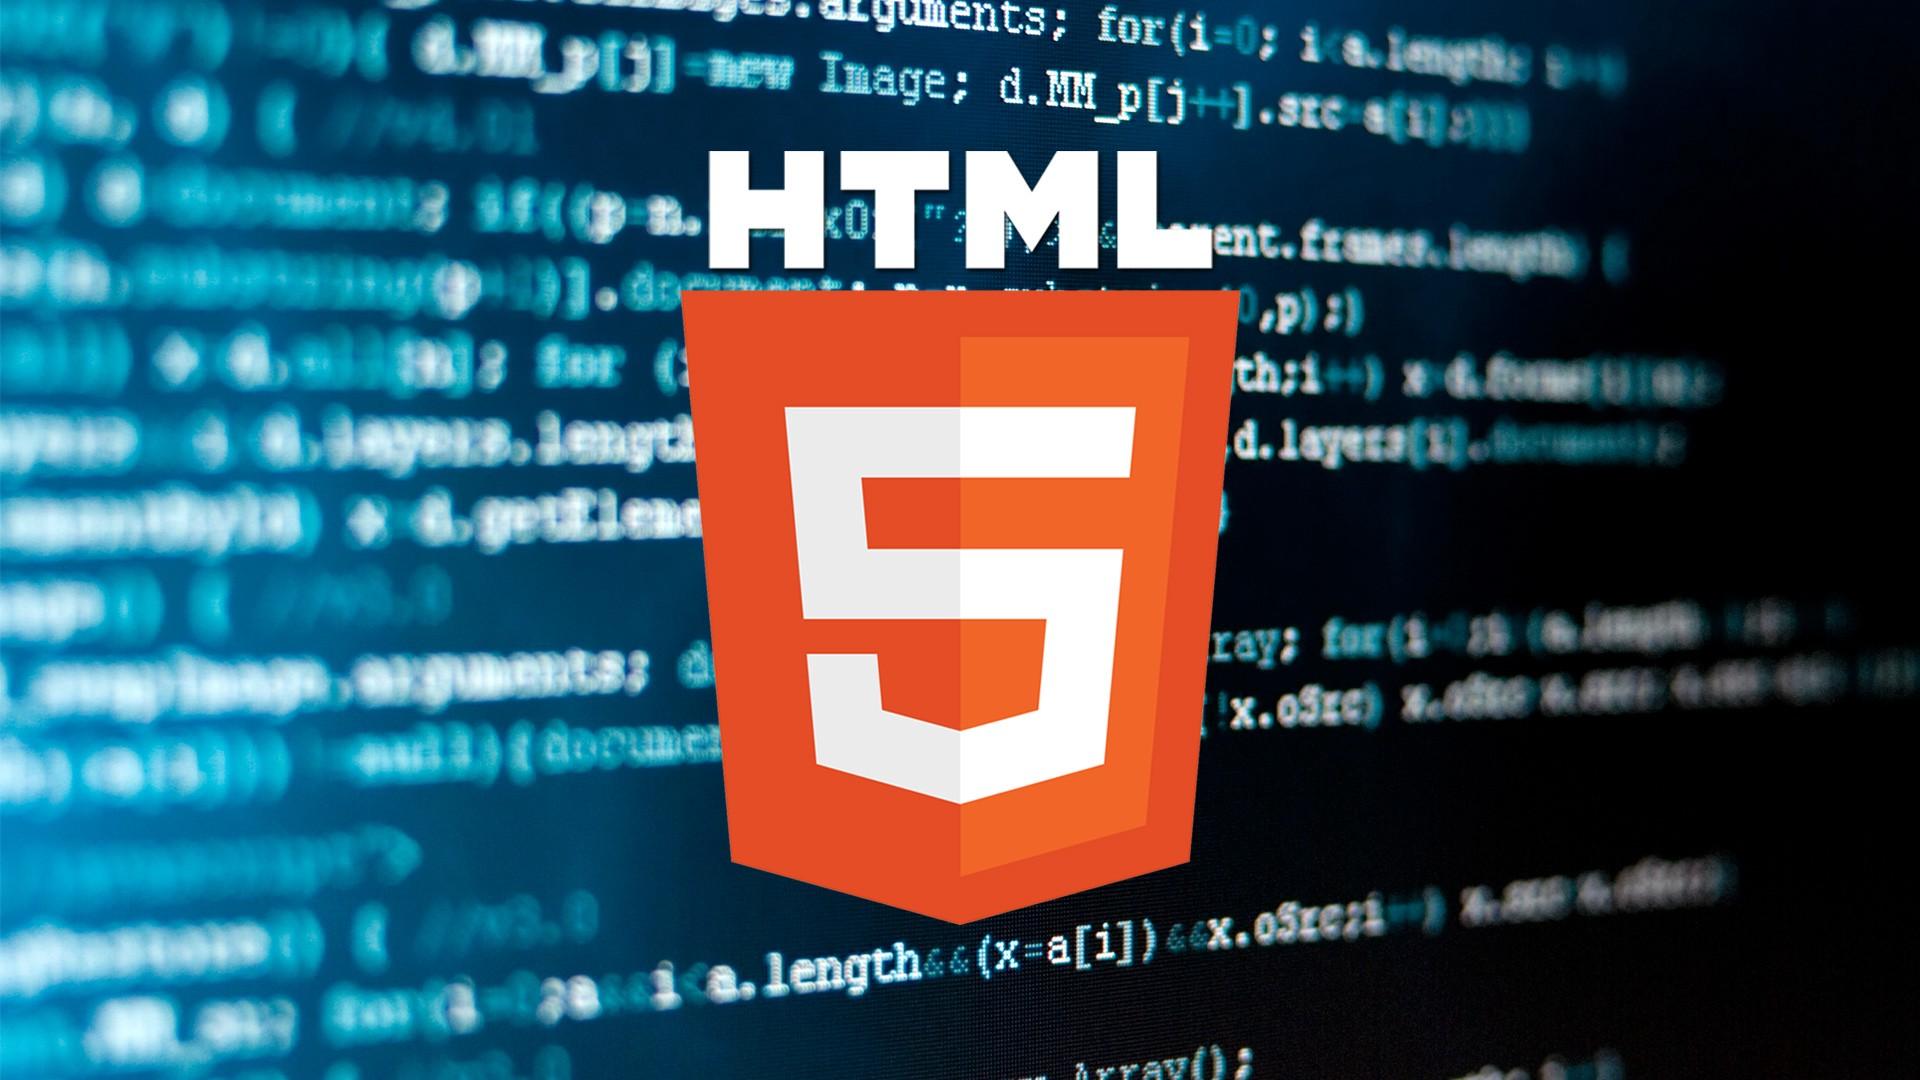 5 ترفند HTML که هیچ کس در مورد اون صحبت نمی کنه